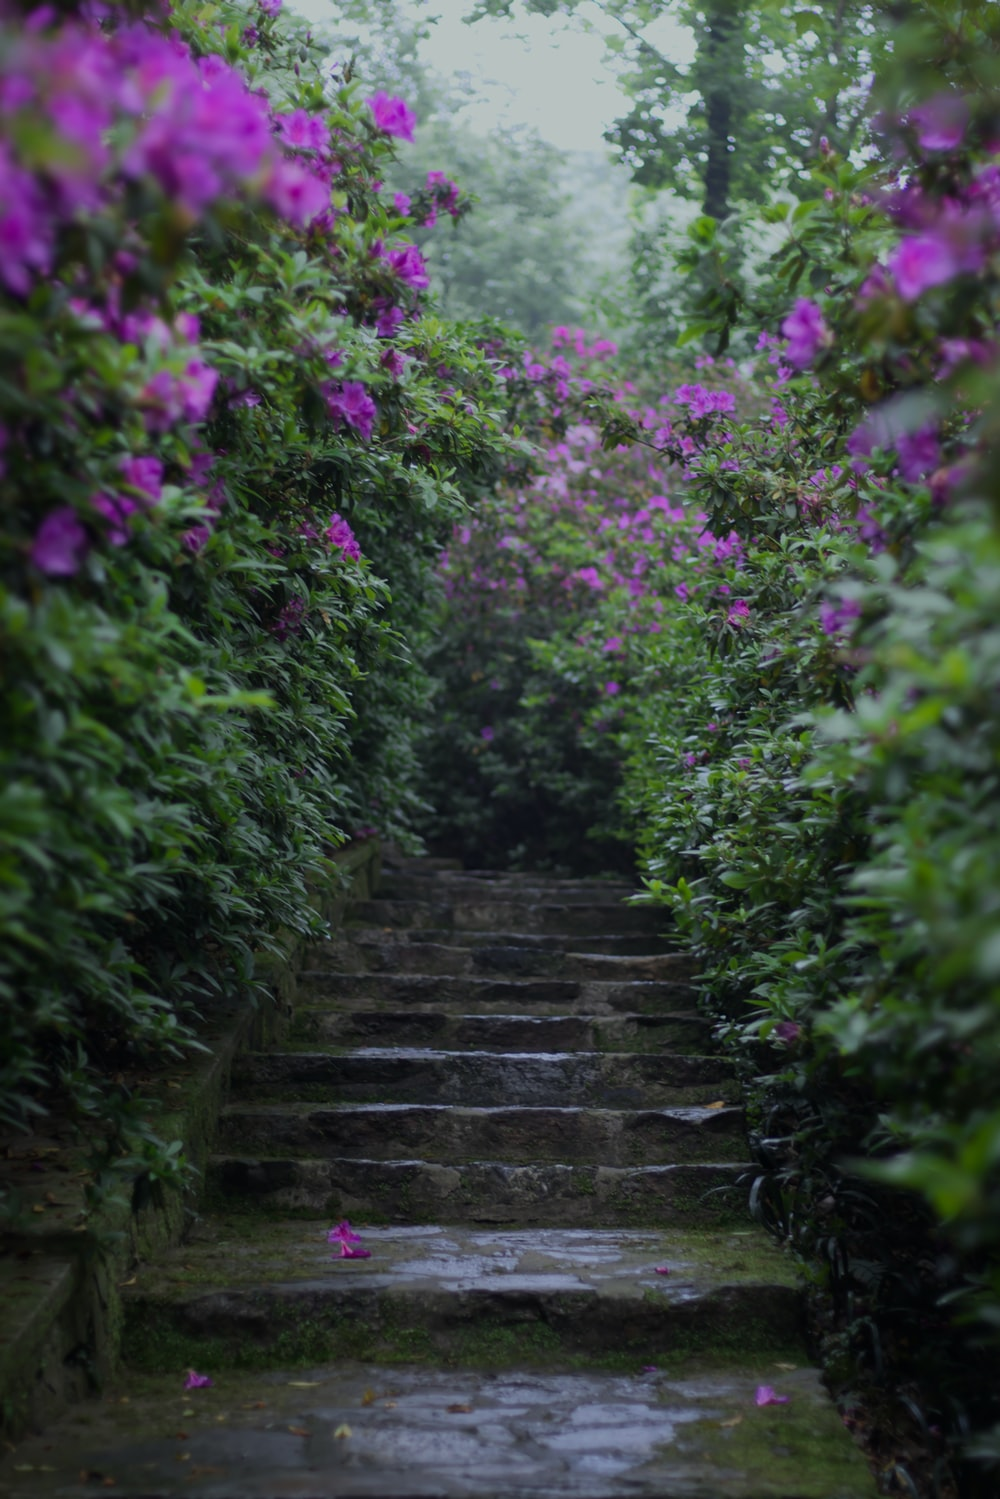 purple flower petals on stairs